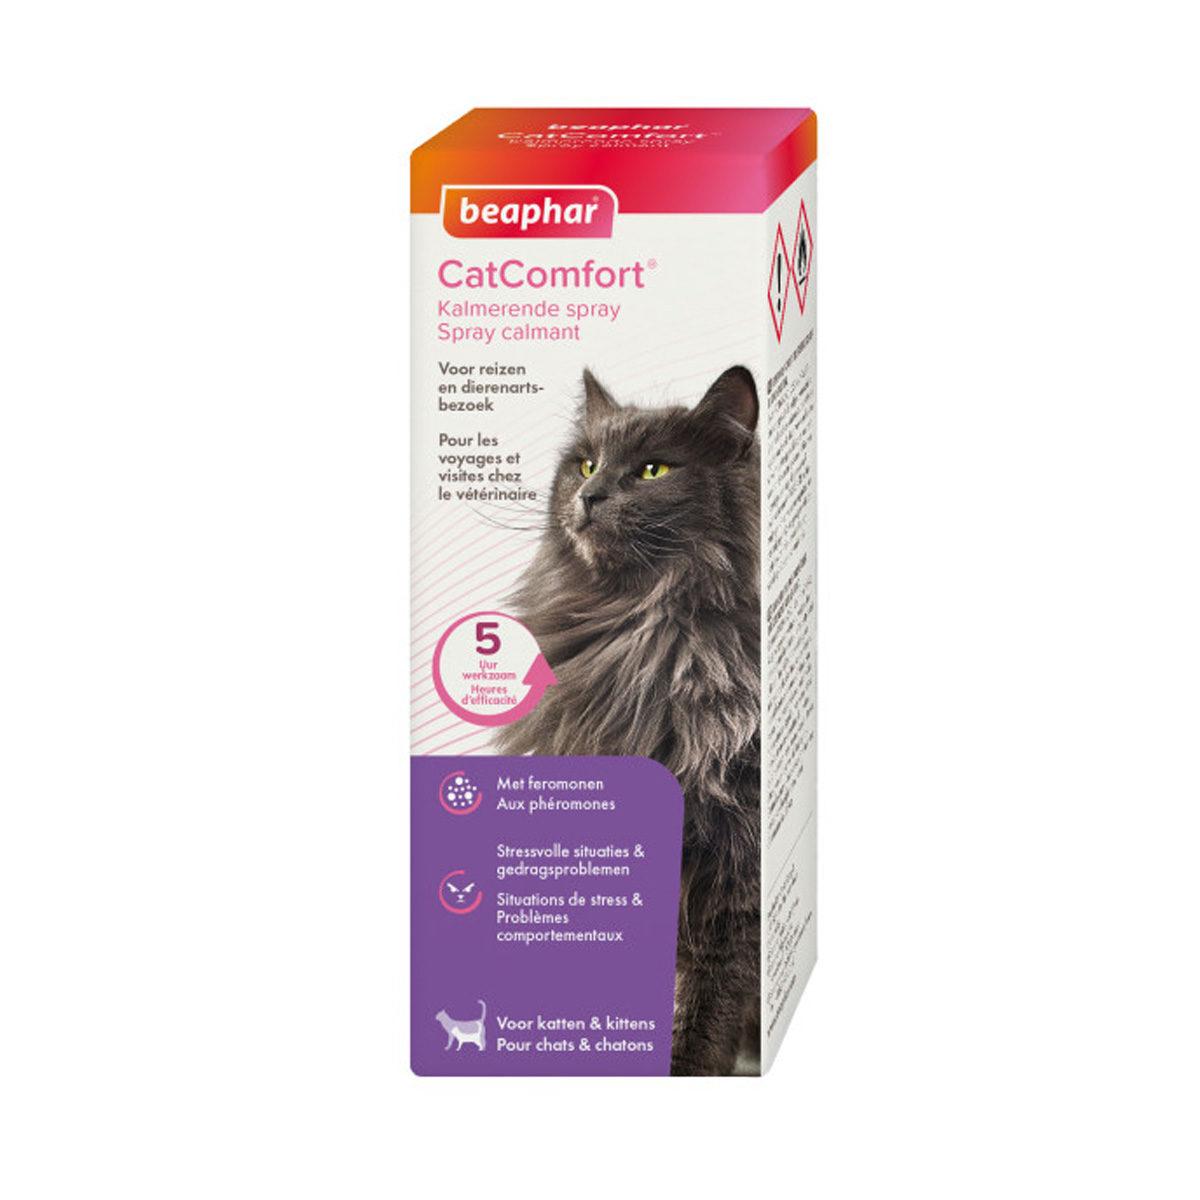 Beaphar CatComfort & Kalmerende Spray 60 ml